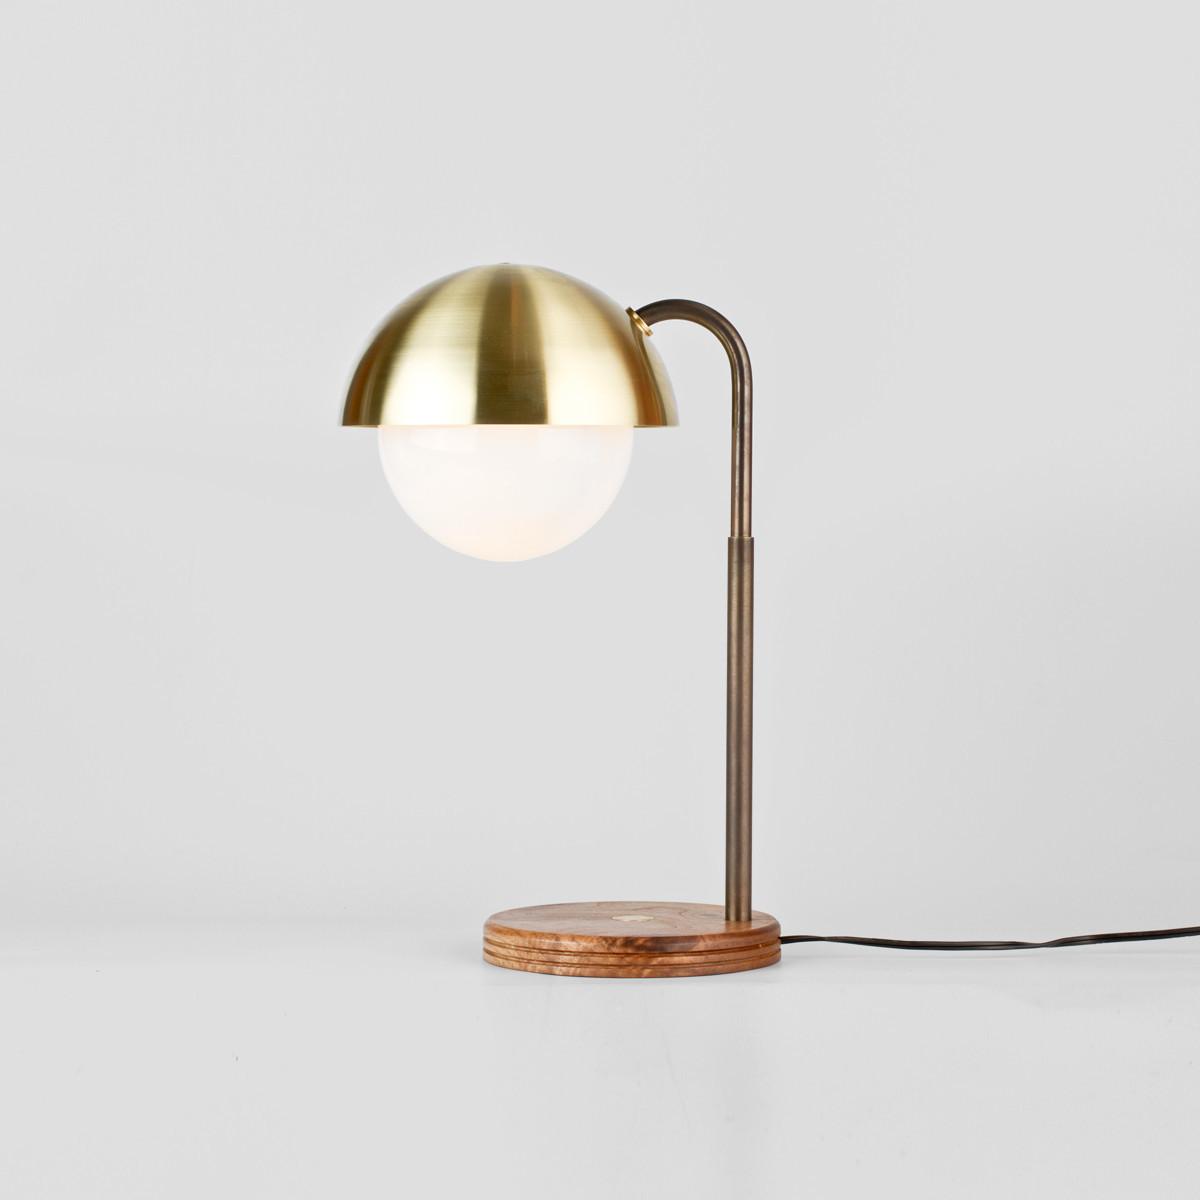 round desk lamp made of brass